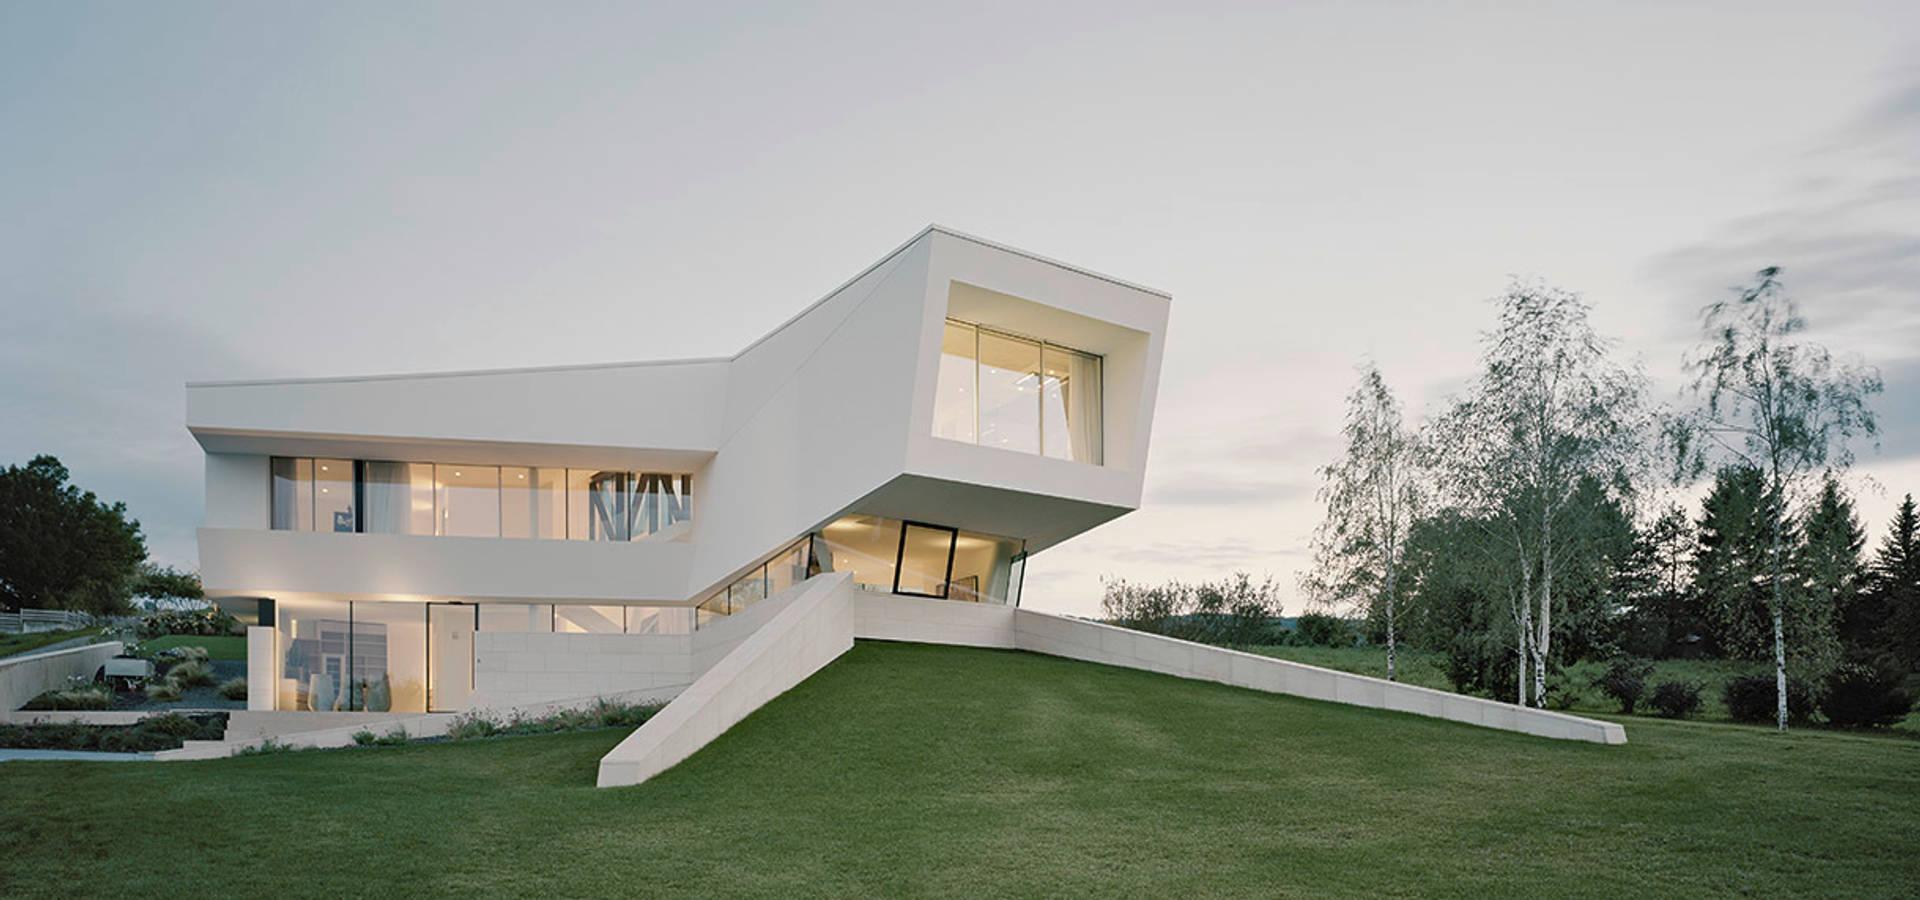 project a01 architects, ZT Gmbh